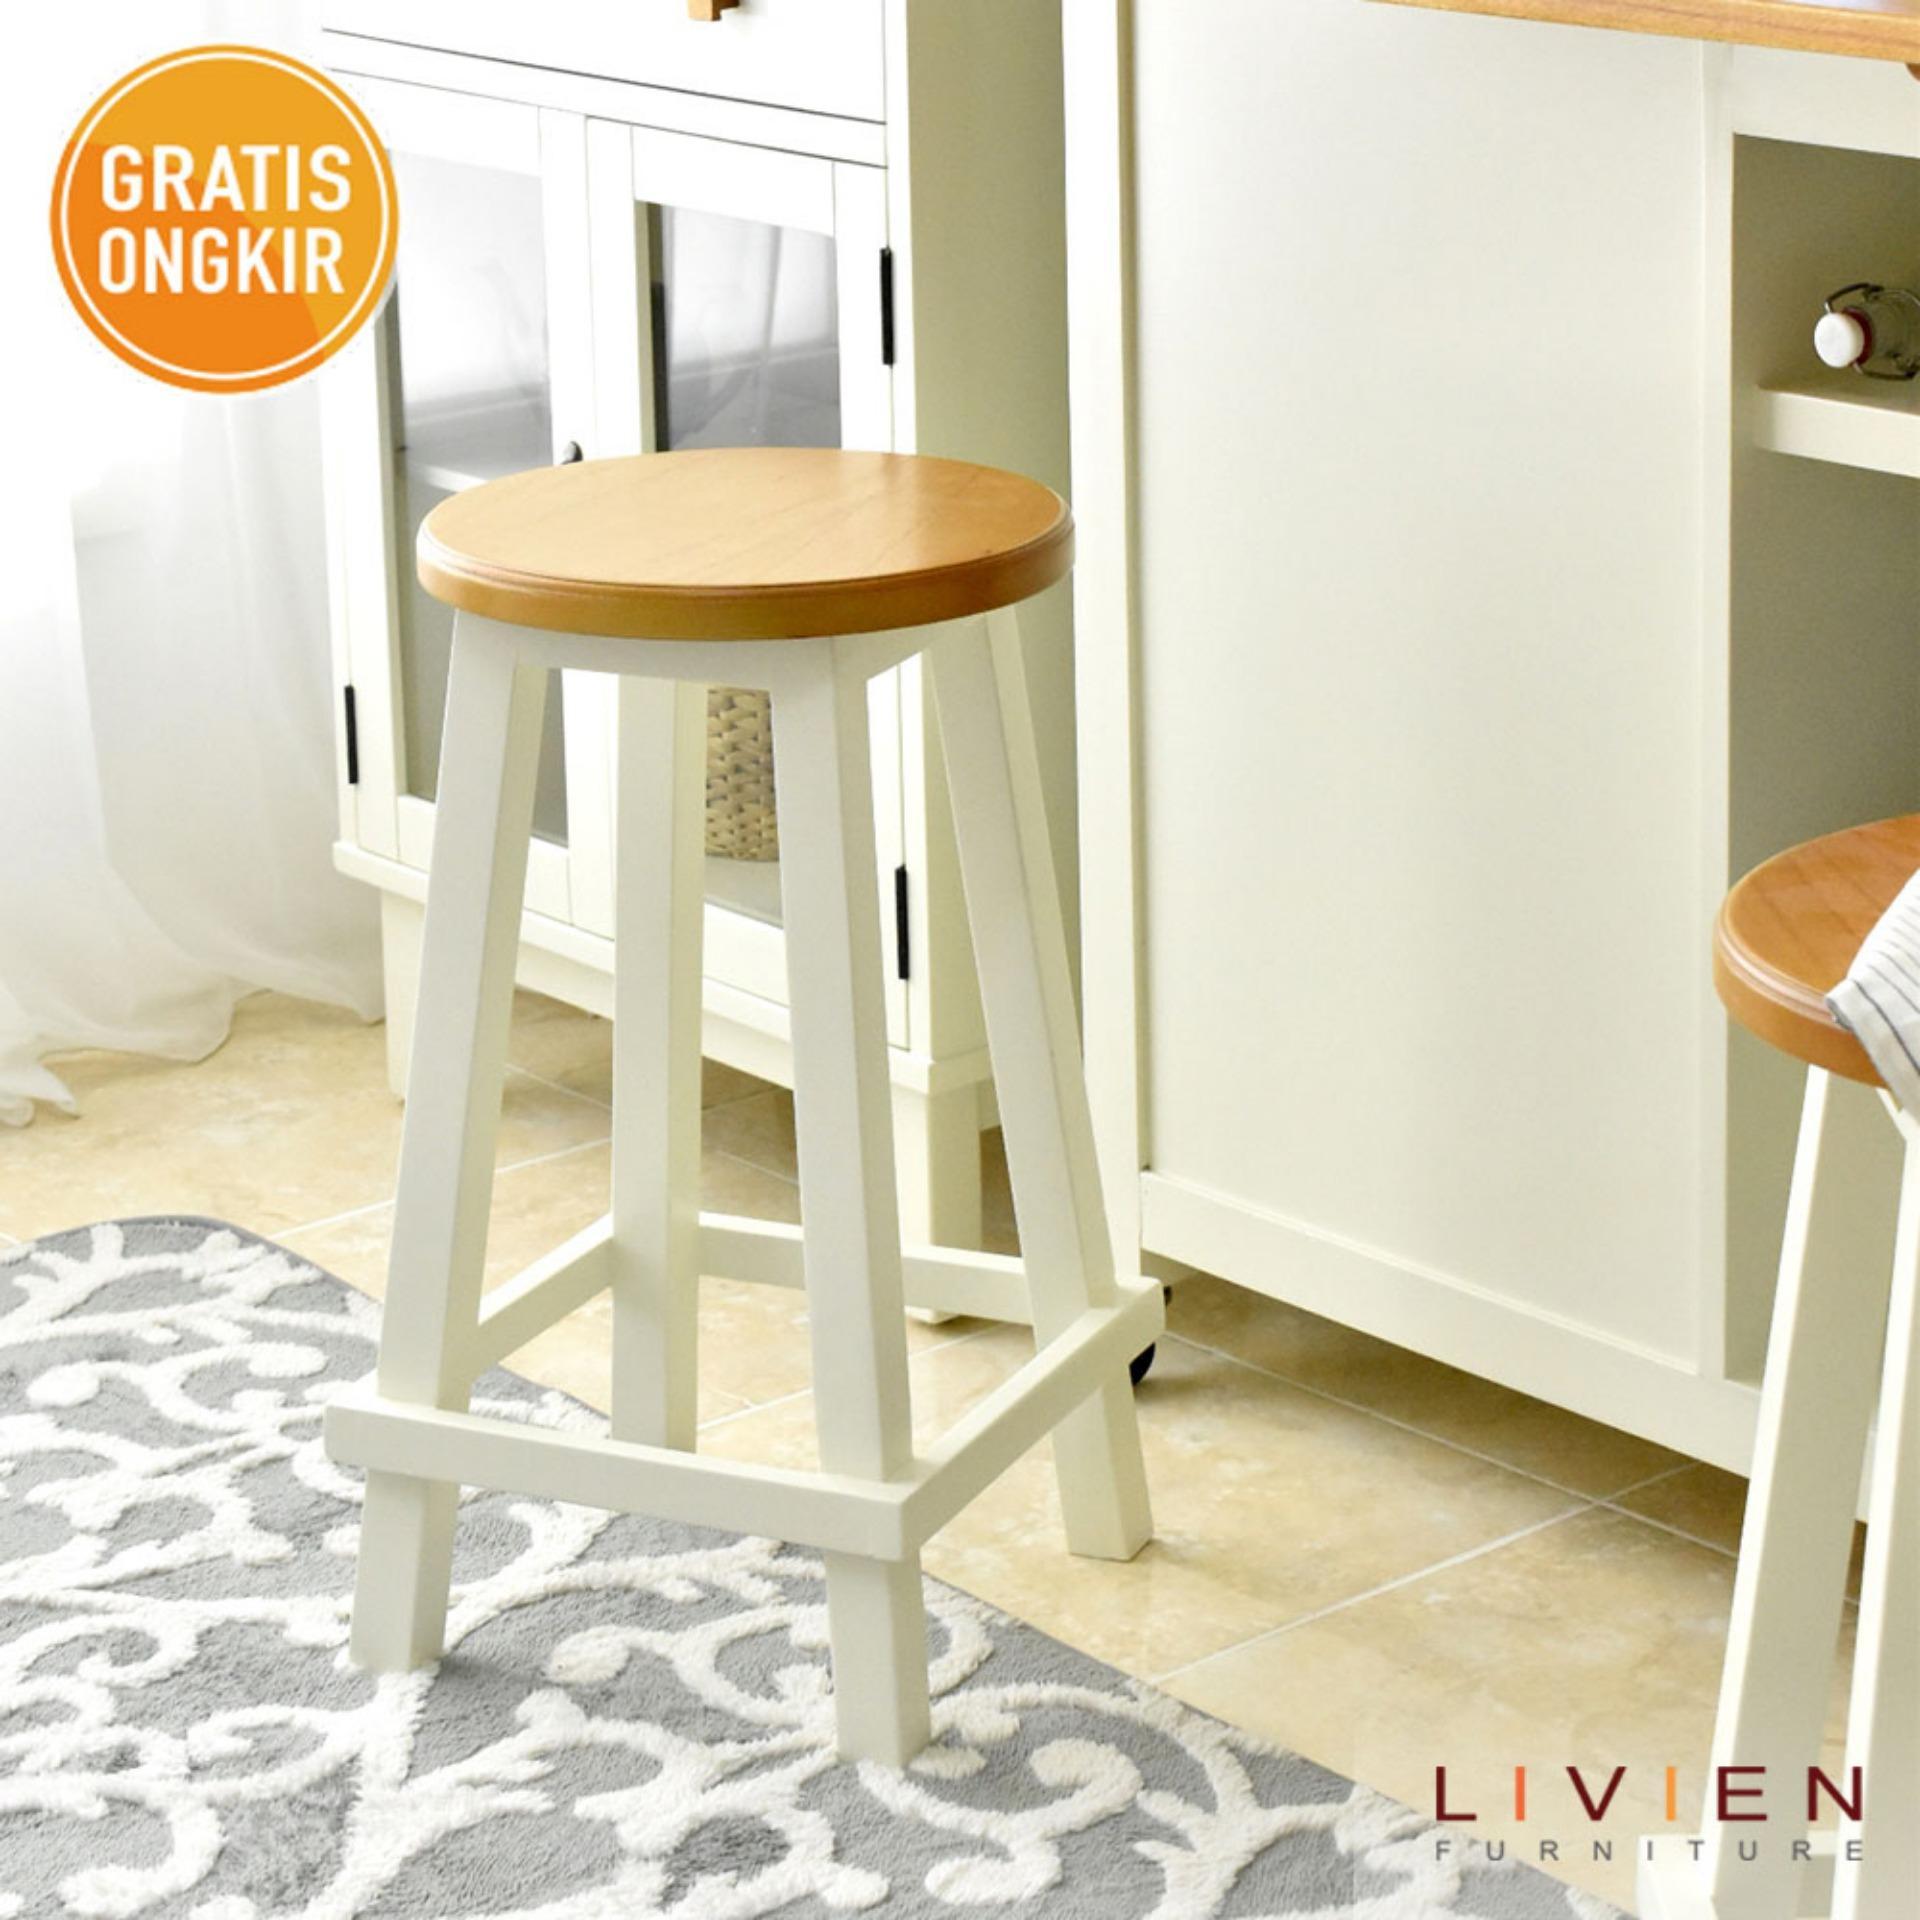 Livien Furniture Brand Rak Buku Mayple Story 5 Tingkat Round Stool Maple Series S Kursi Bulat 2 Pcs